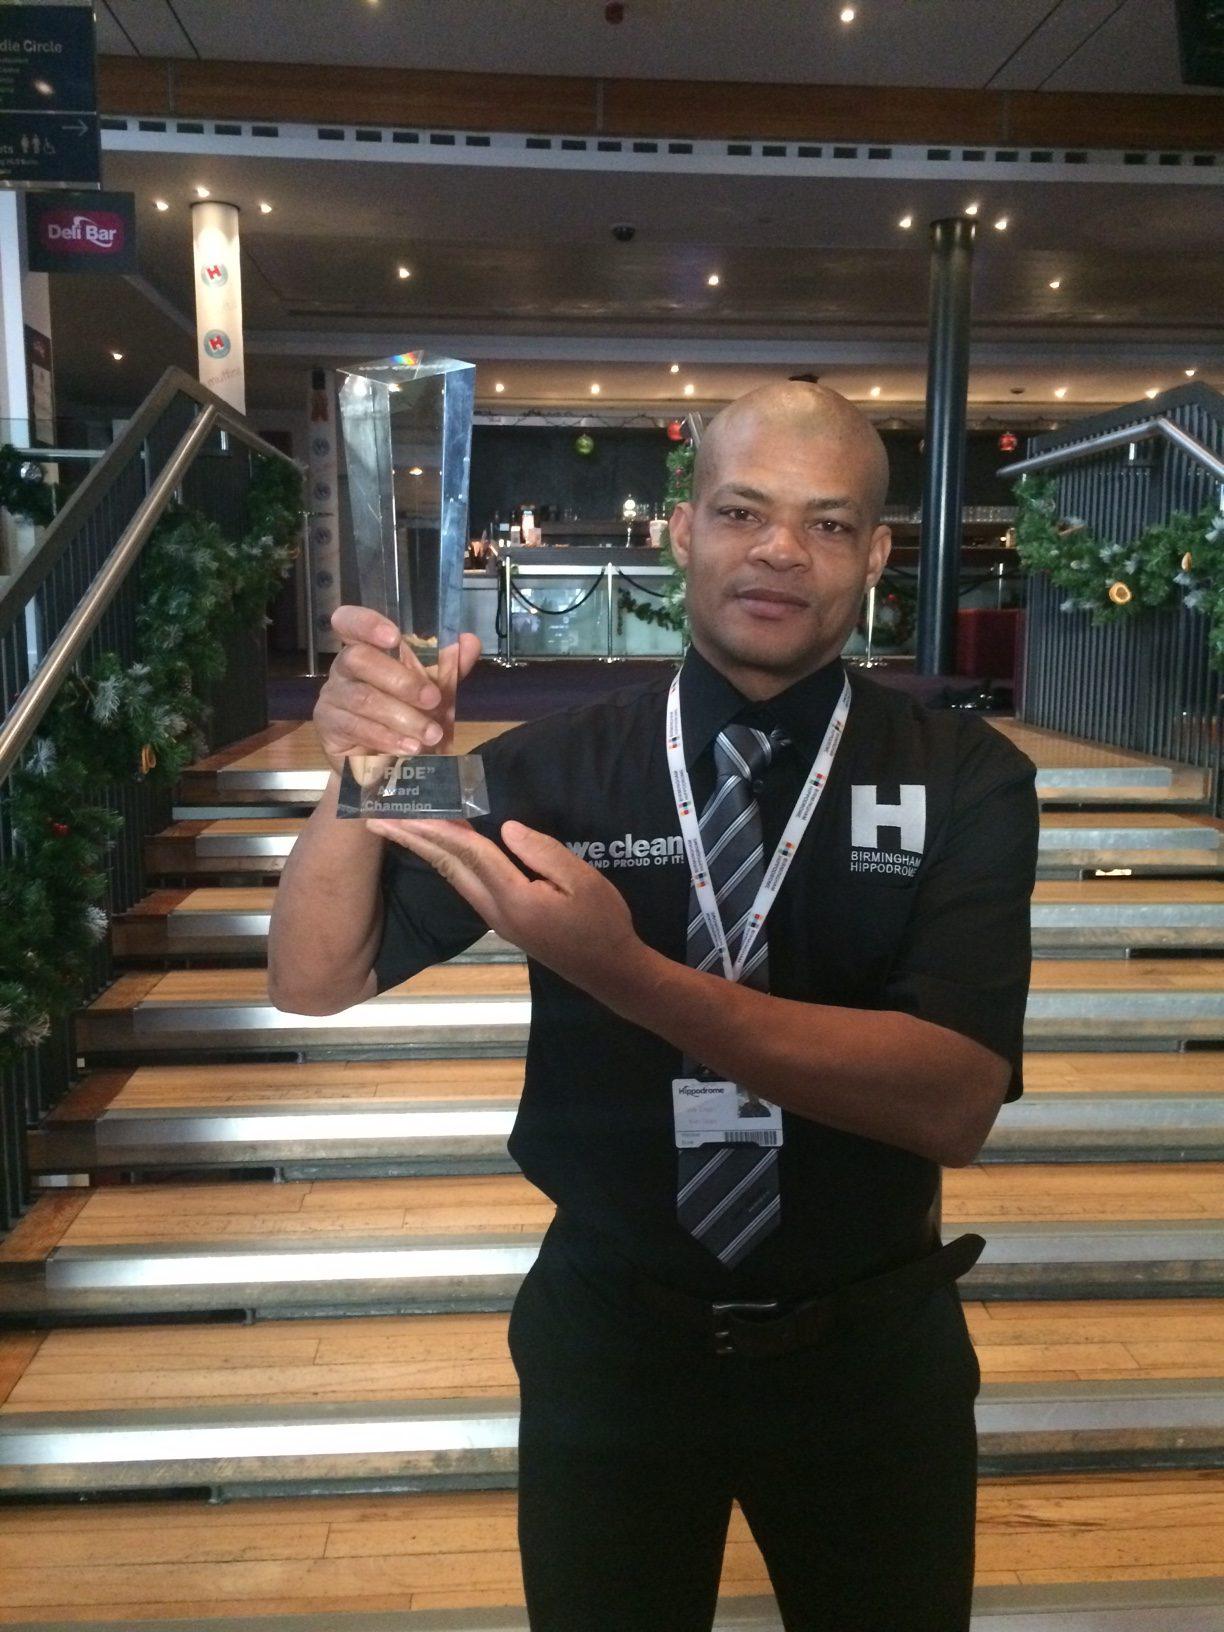 IMG_0058-e1516383770294 Winston Scott Is The 2017 'Dee Richards' Pride Award Champion